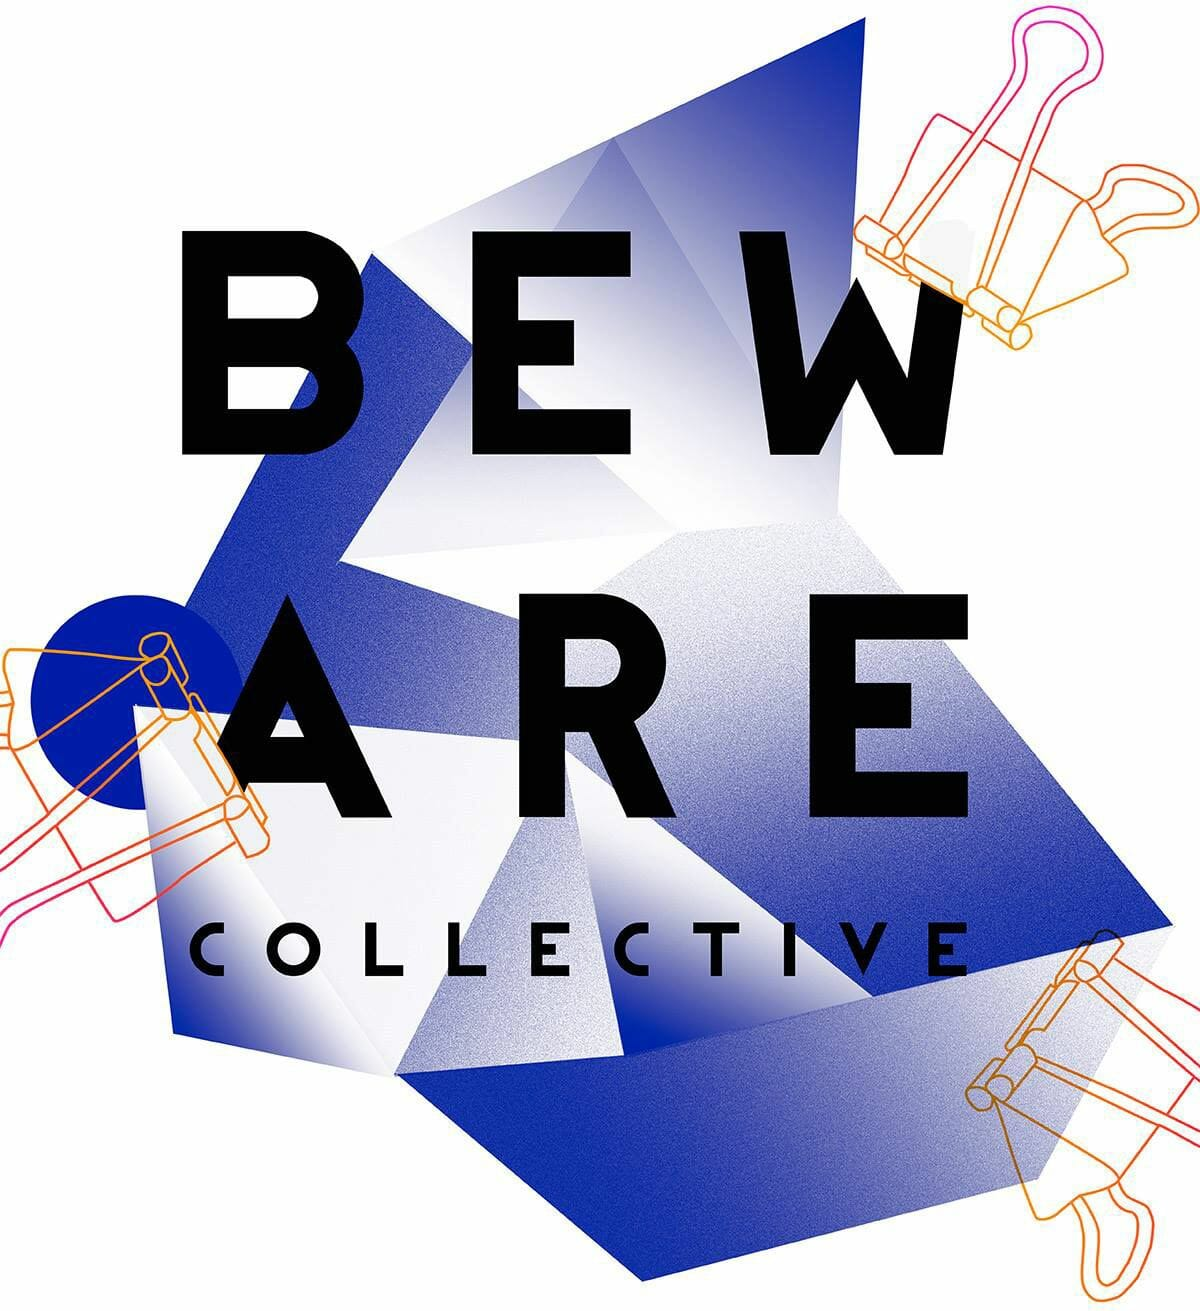 Beware Collective investit le Batofar le mardi 15 juillet 2014 ! 1